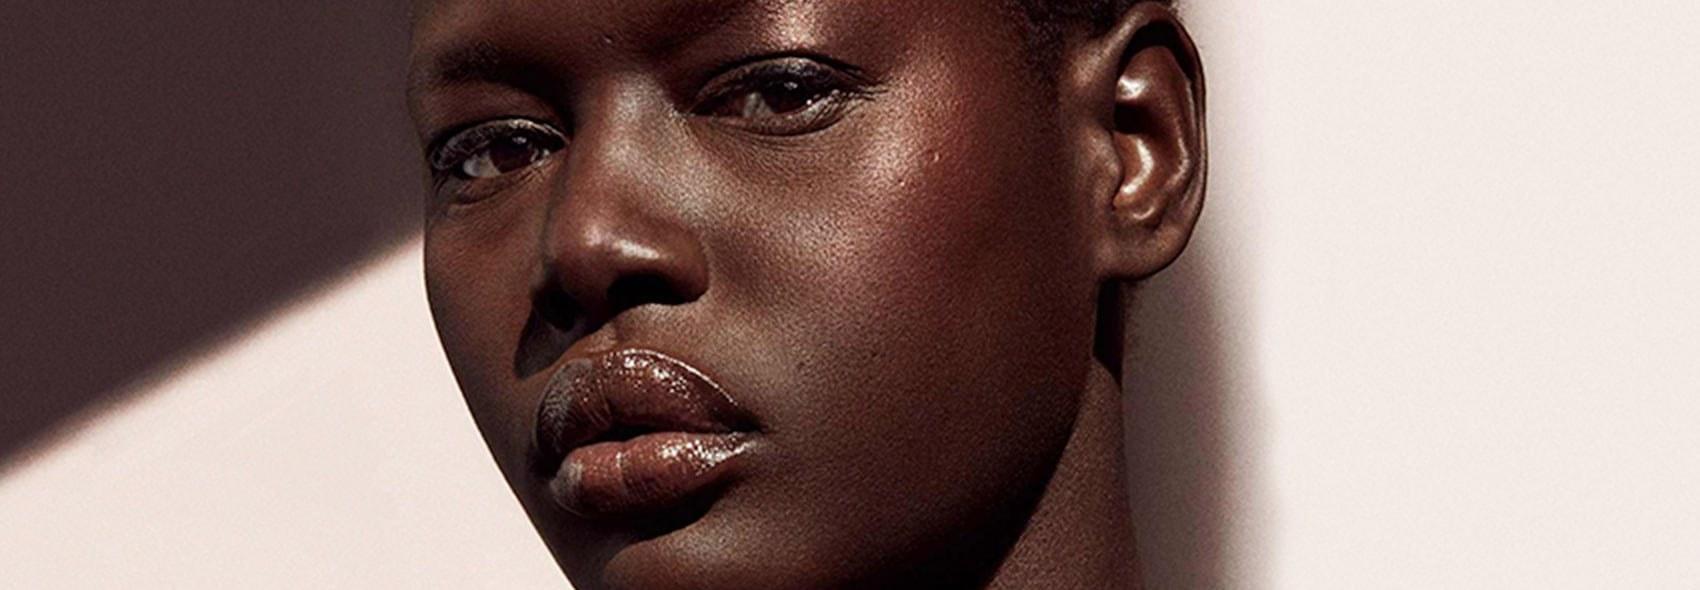 Skin pigmentation LYMA 5